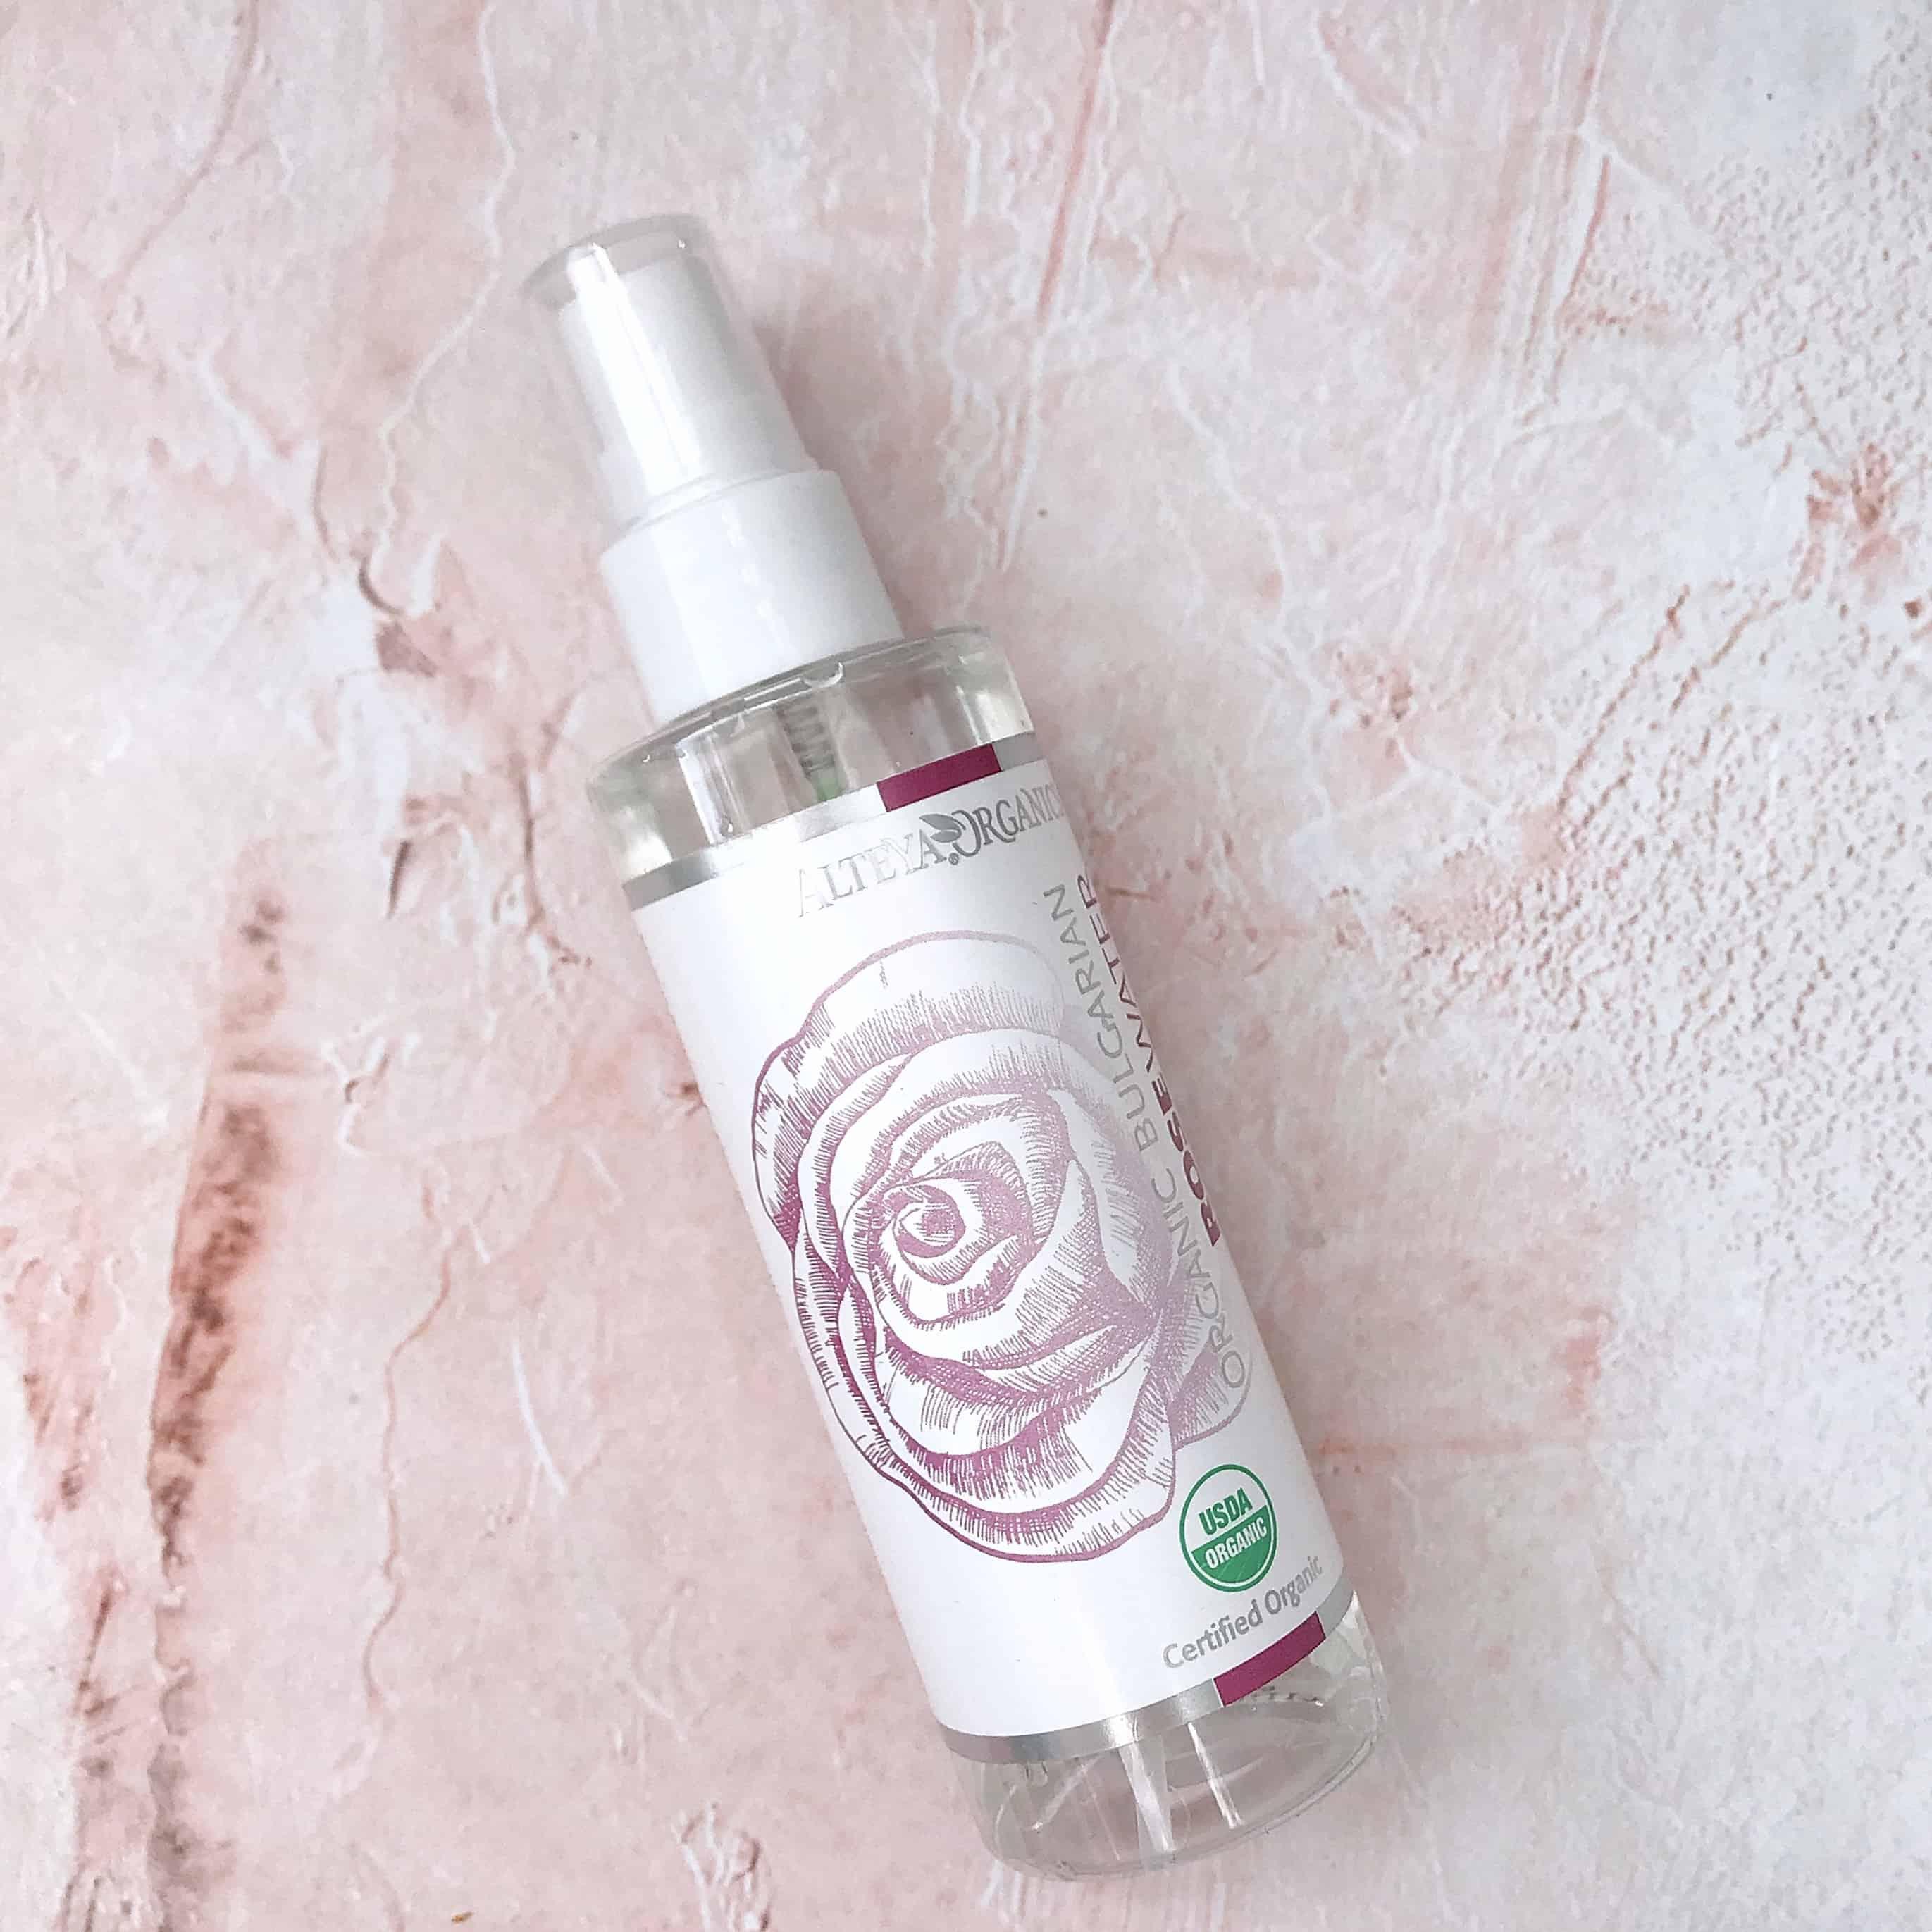 Alteya Organics Certified Organic Bulgarian Rose Water Spray